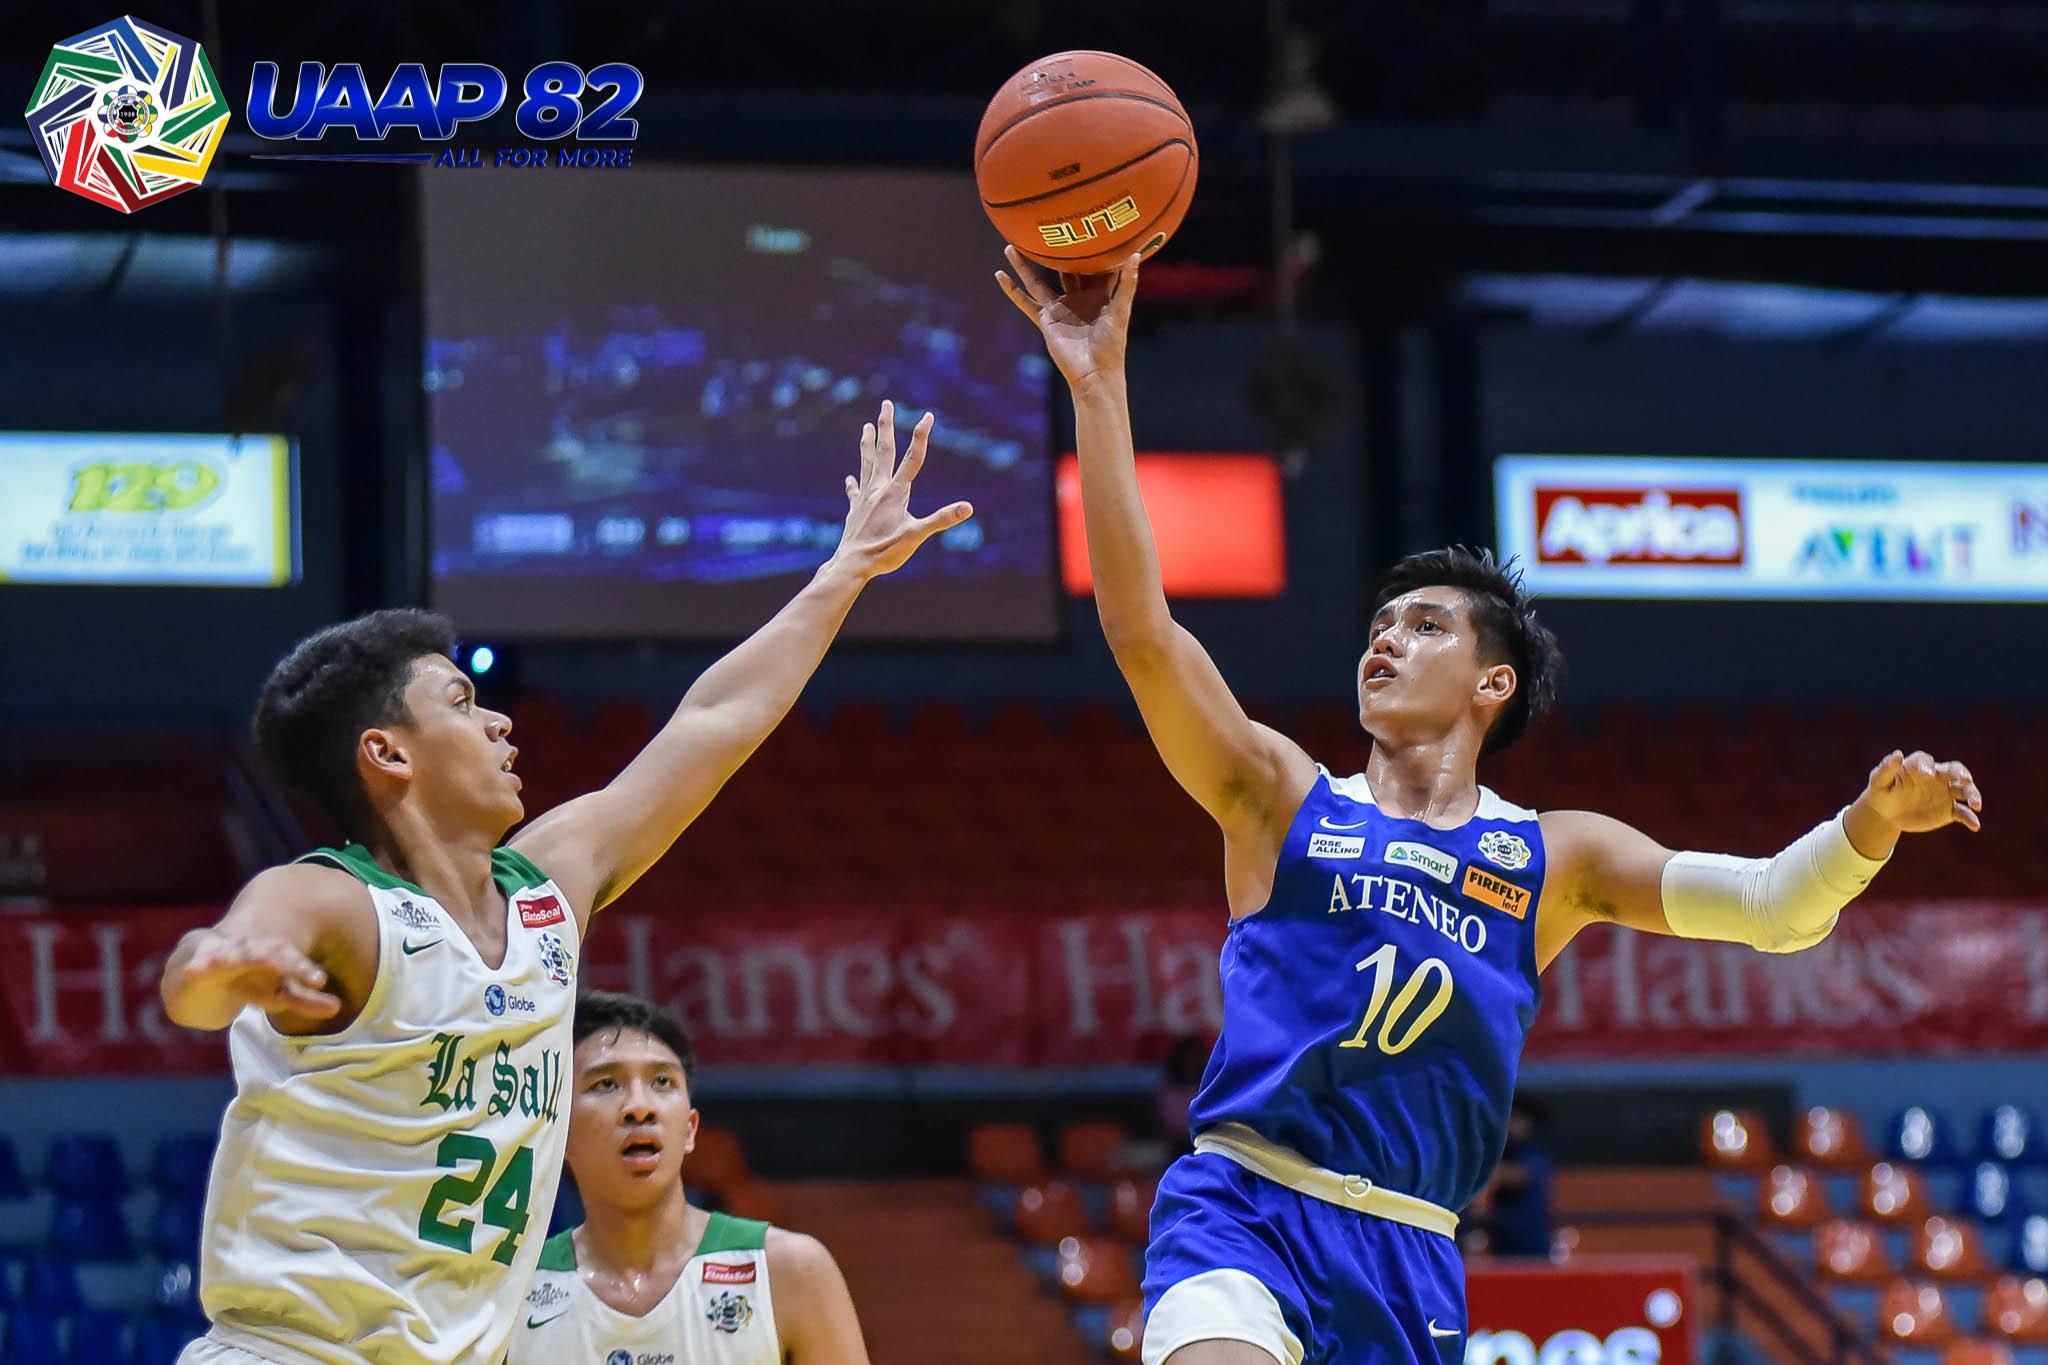 UAAP-82-Jrs-Basketball-ADMU-vs.-DLSZ-Padrigao-0422 Fortea, Figueroa, Estacio lead crack UAAP HS class of '21 ADMU Basketball FEU News NU UAAP UP UST  - philippine sports news